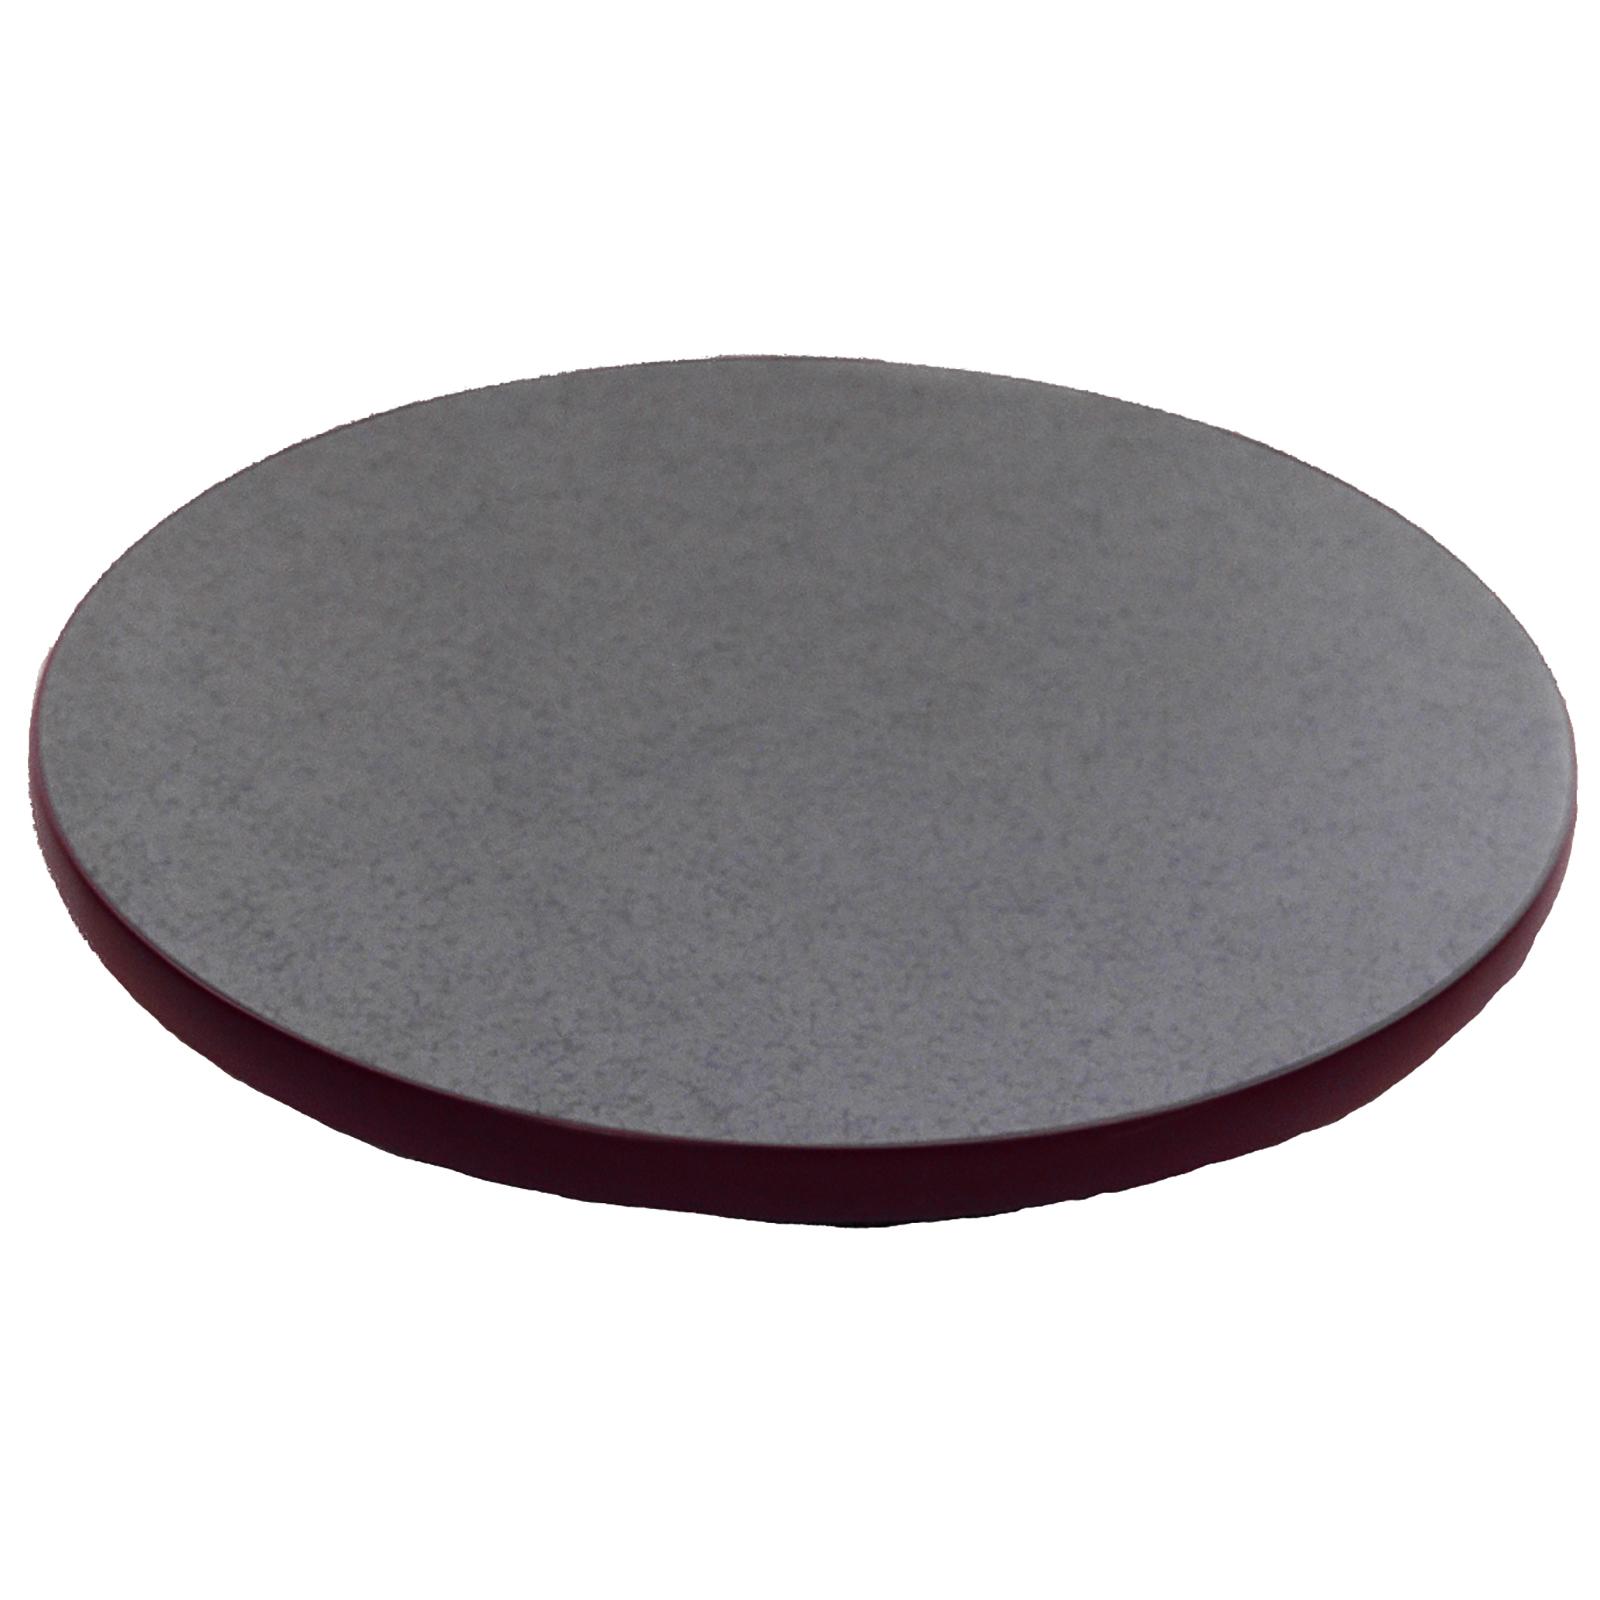 Oak Street CTM24R-2 table top, laminate